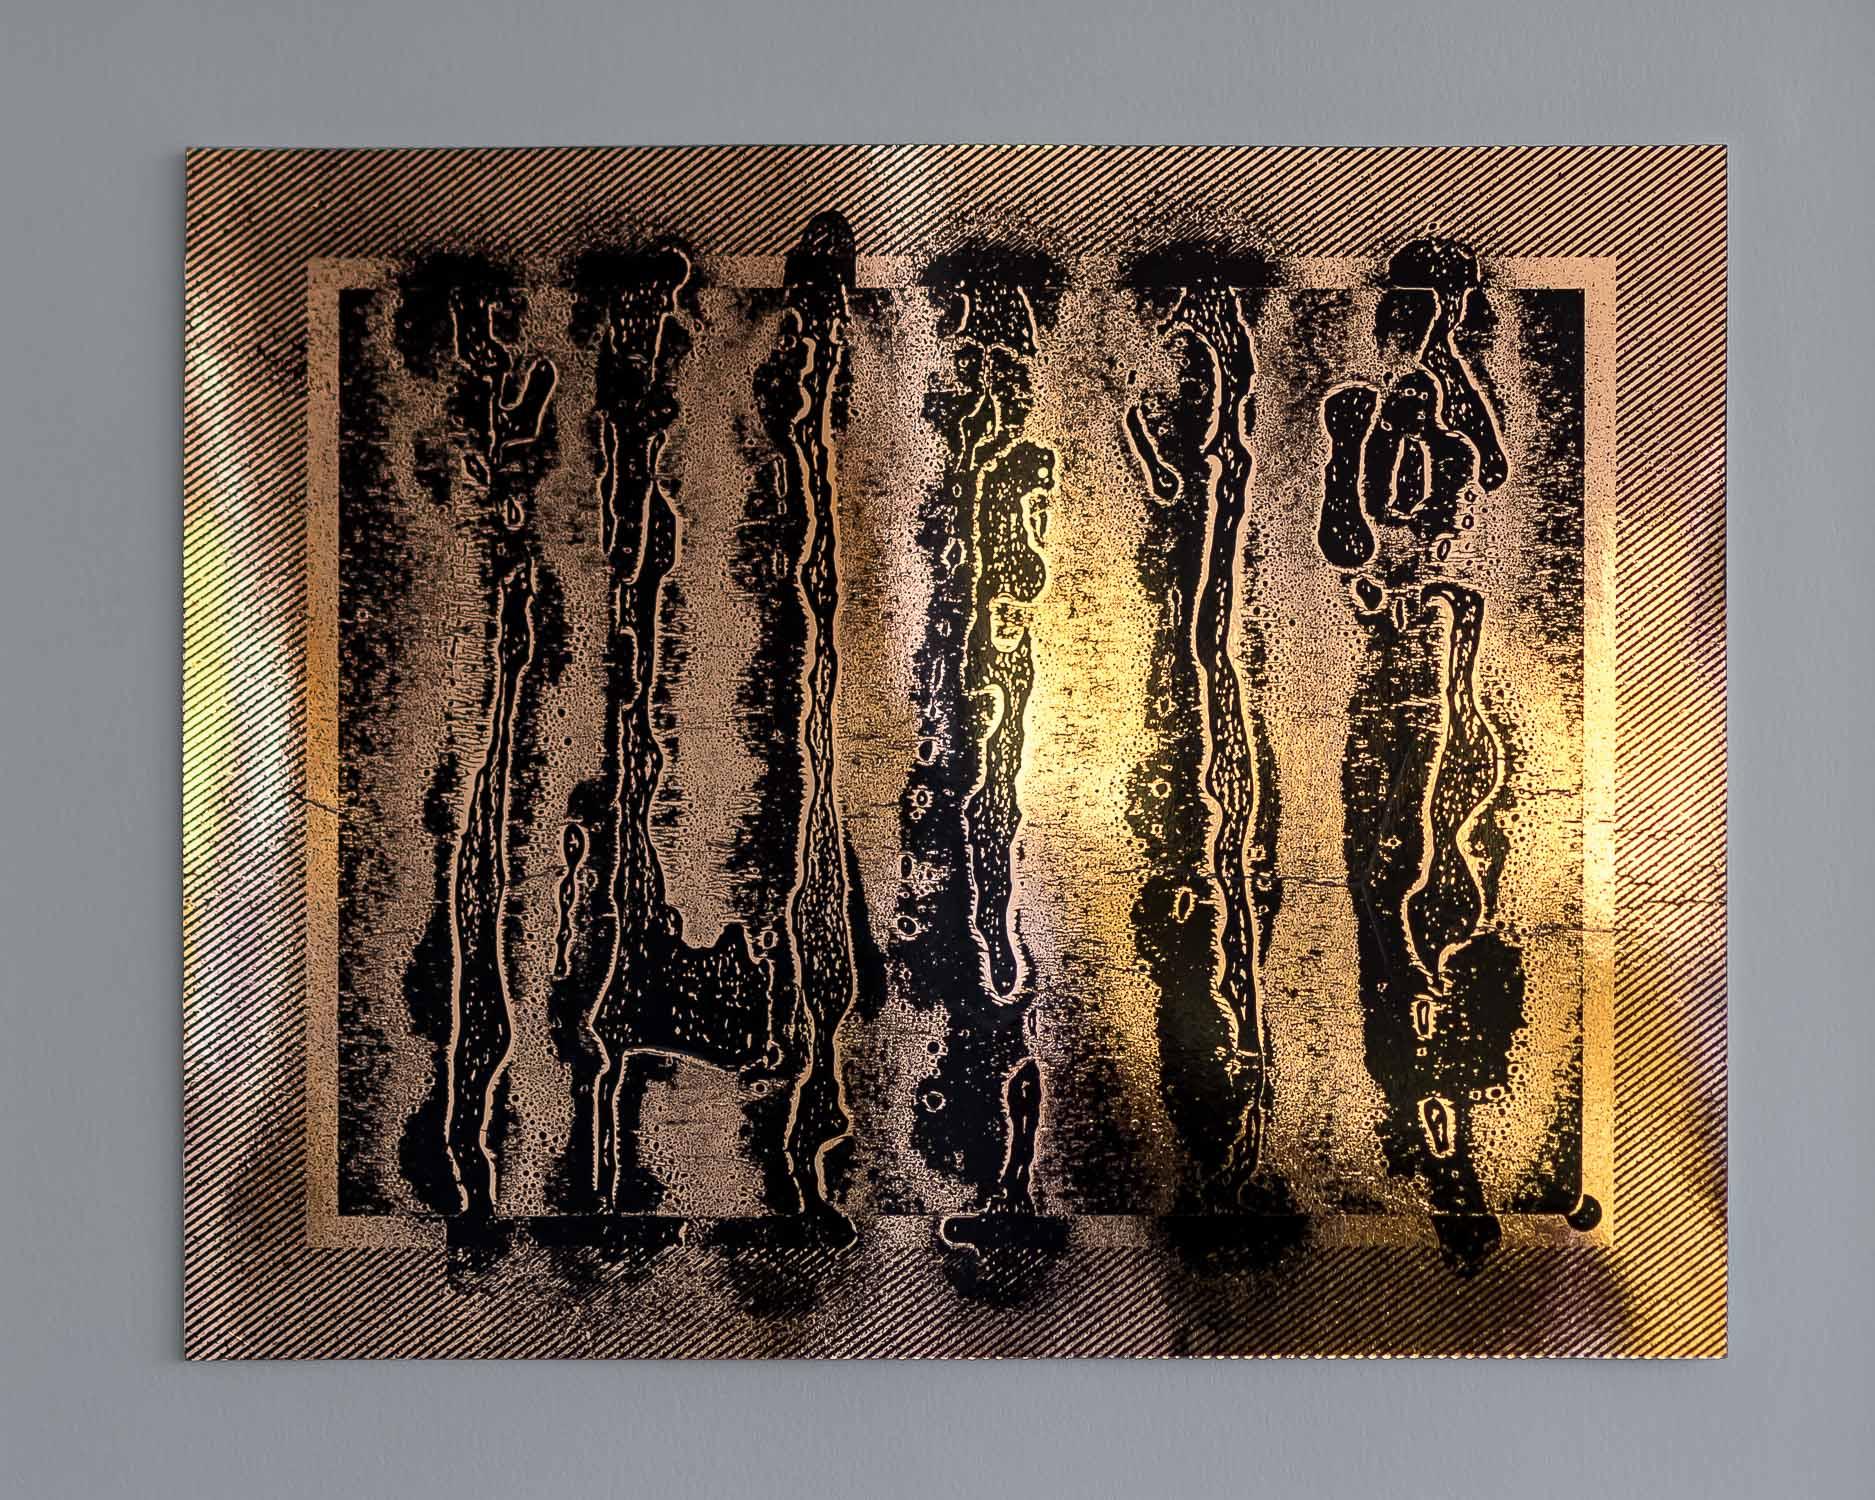 mclark_artwork_web_sold-21.jpg